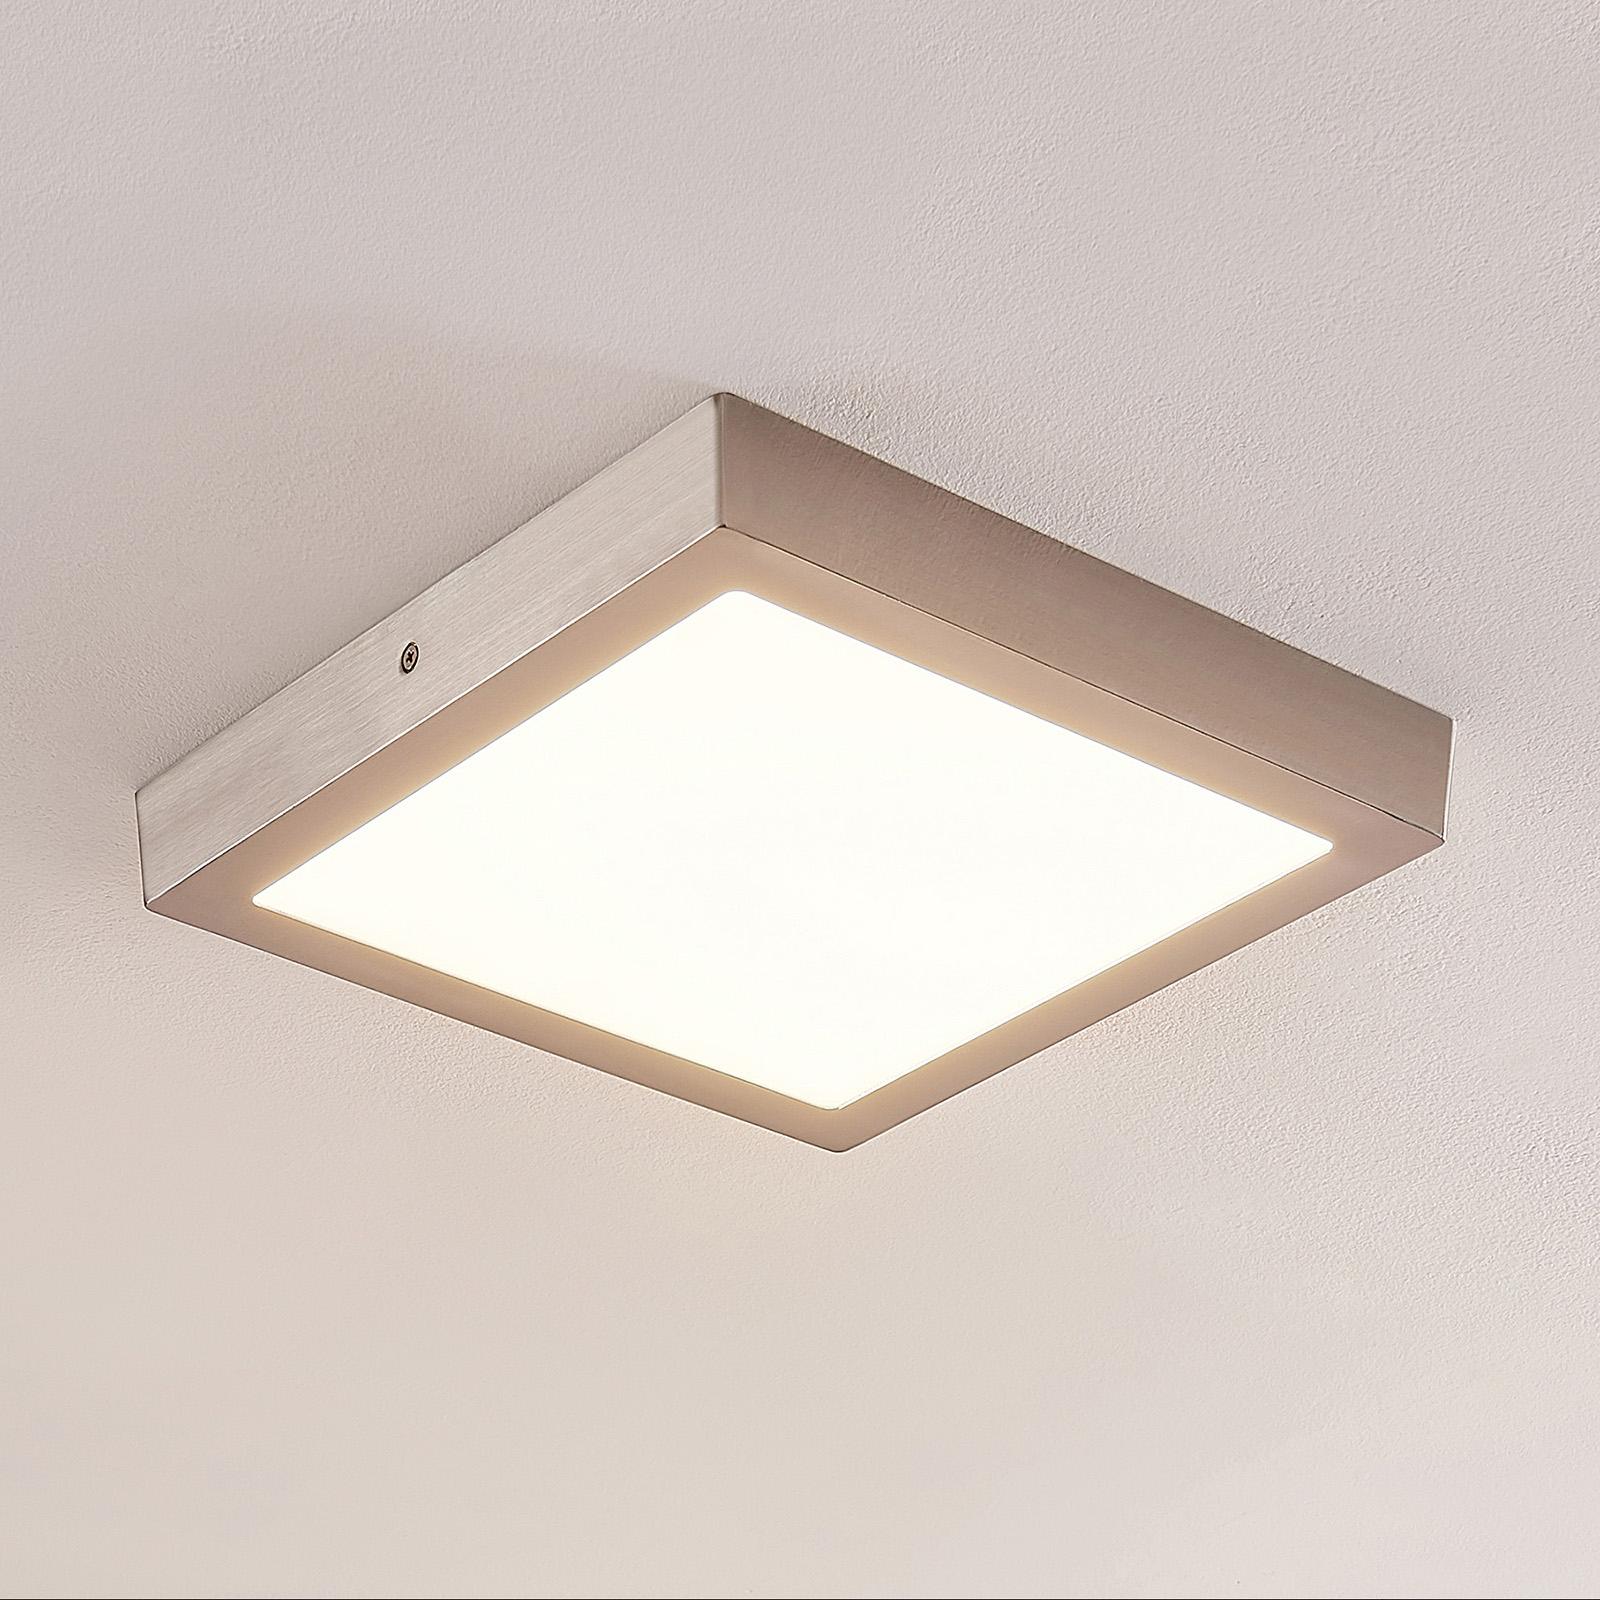 ELC Merina LED-kattovalaisin nikkeli, 30 x 30 cm